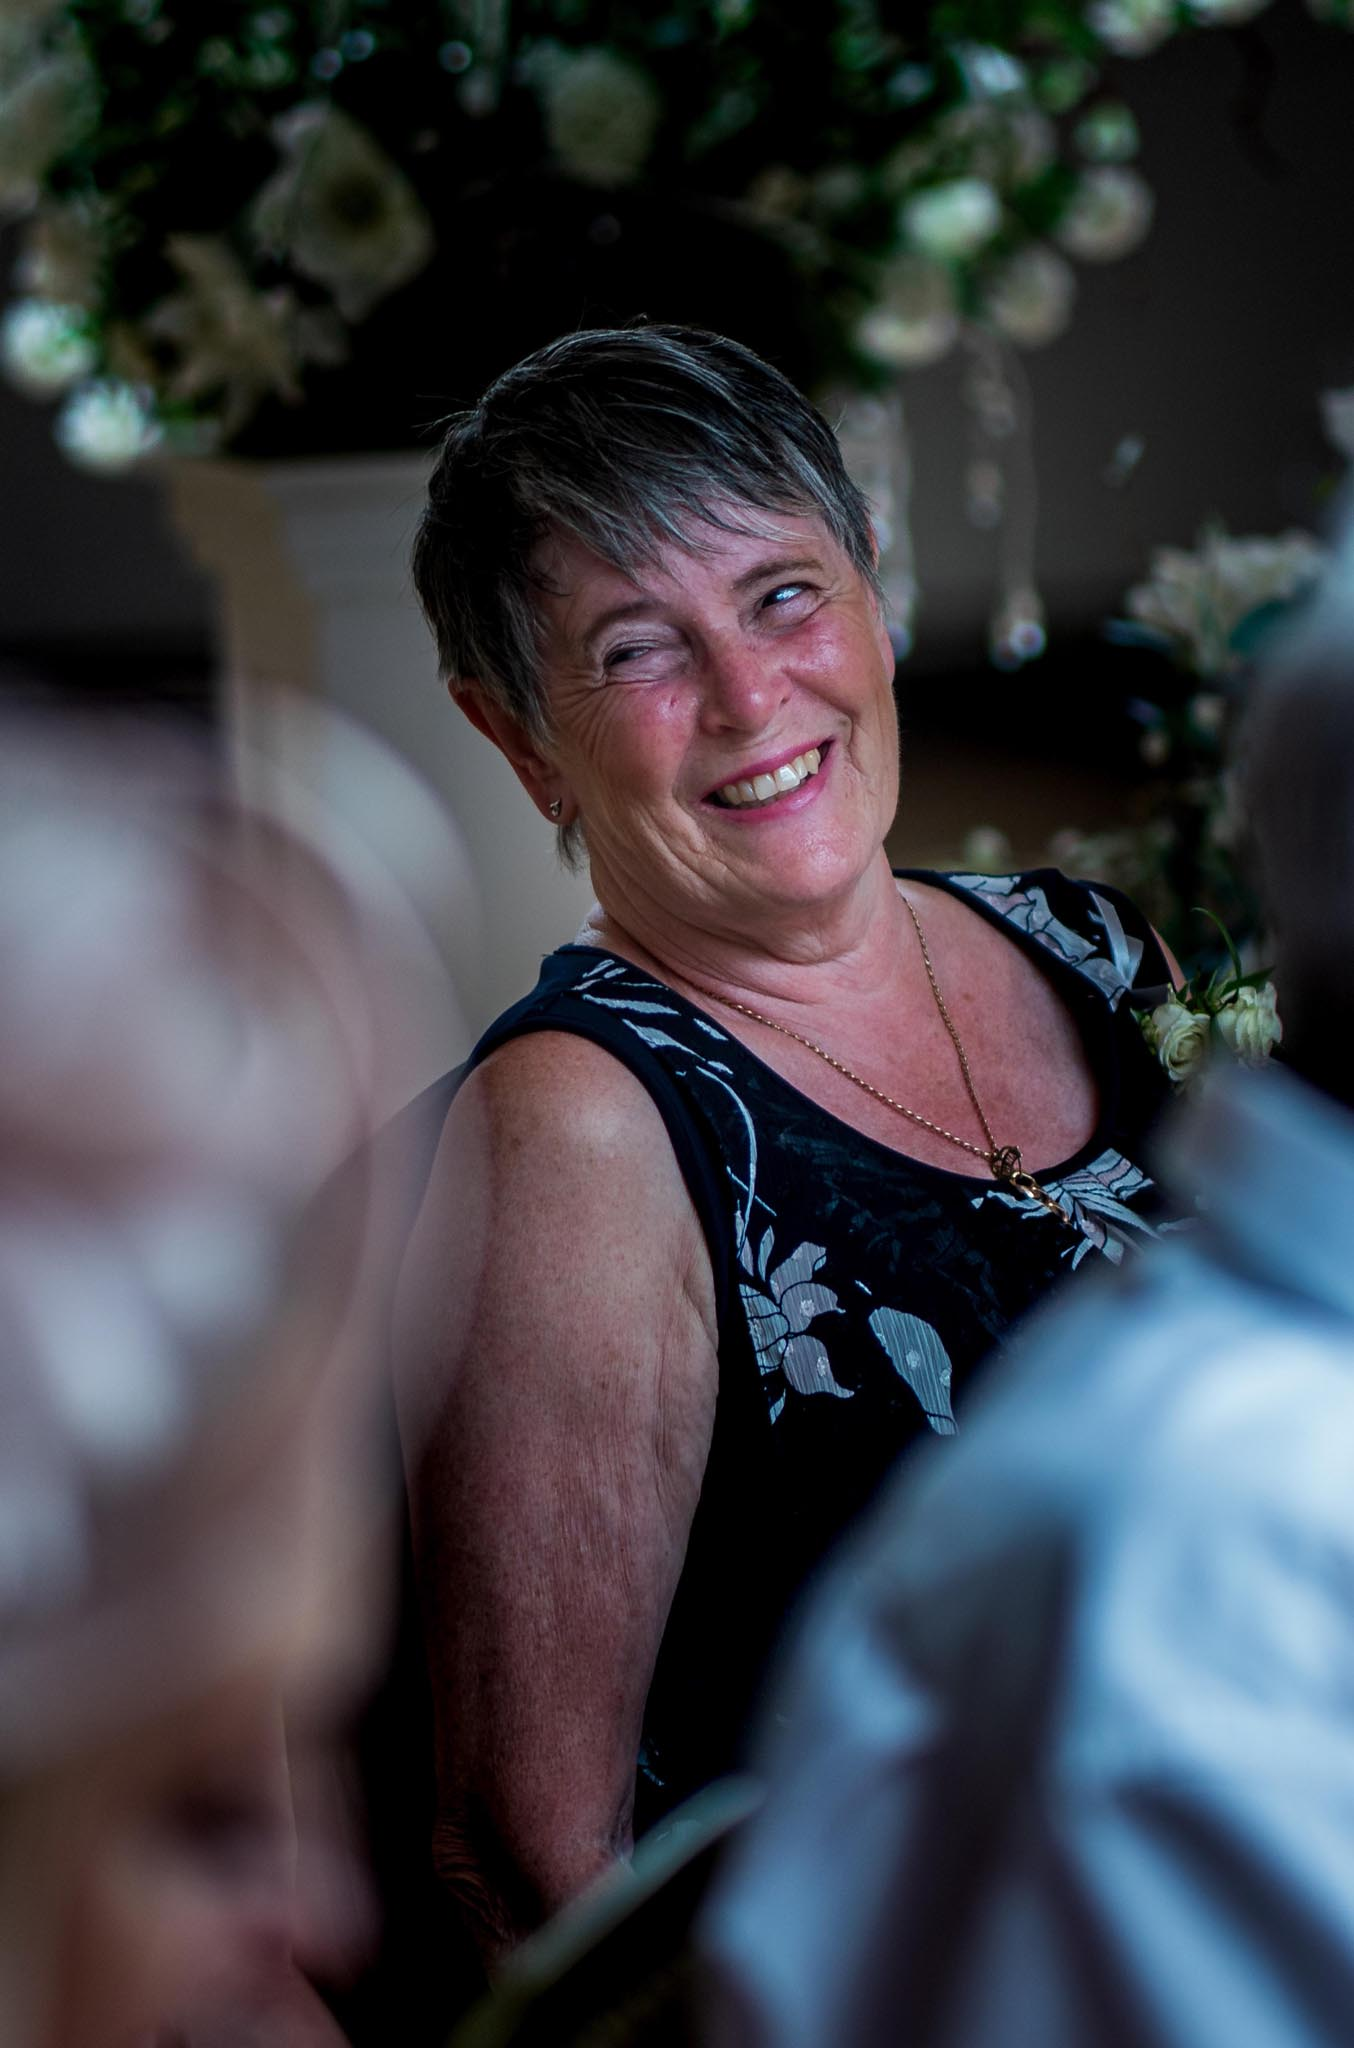 252-Arrivals-Luke-Yasmin-The-Rayleigh-Club-Wedding-Photography.jpg